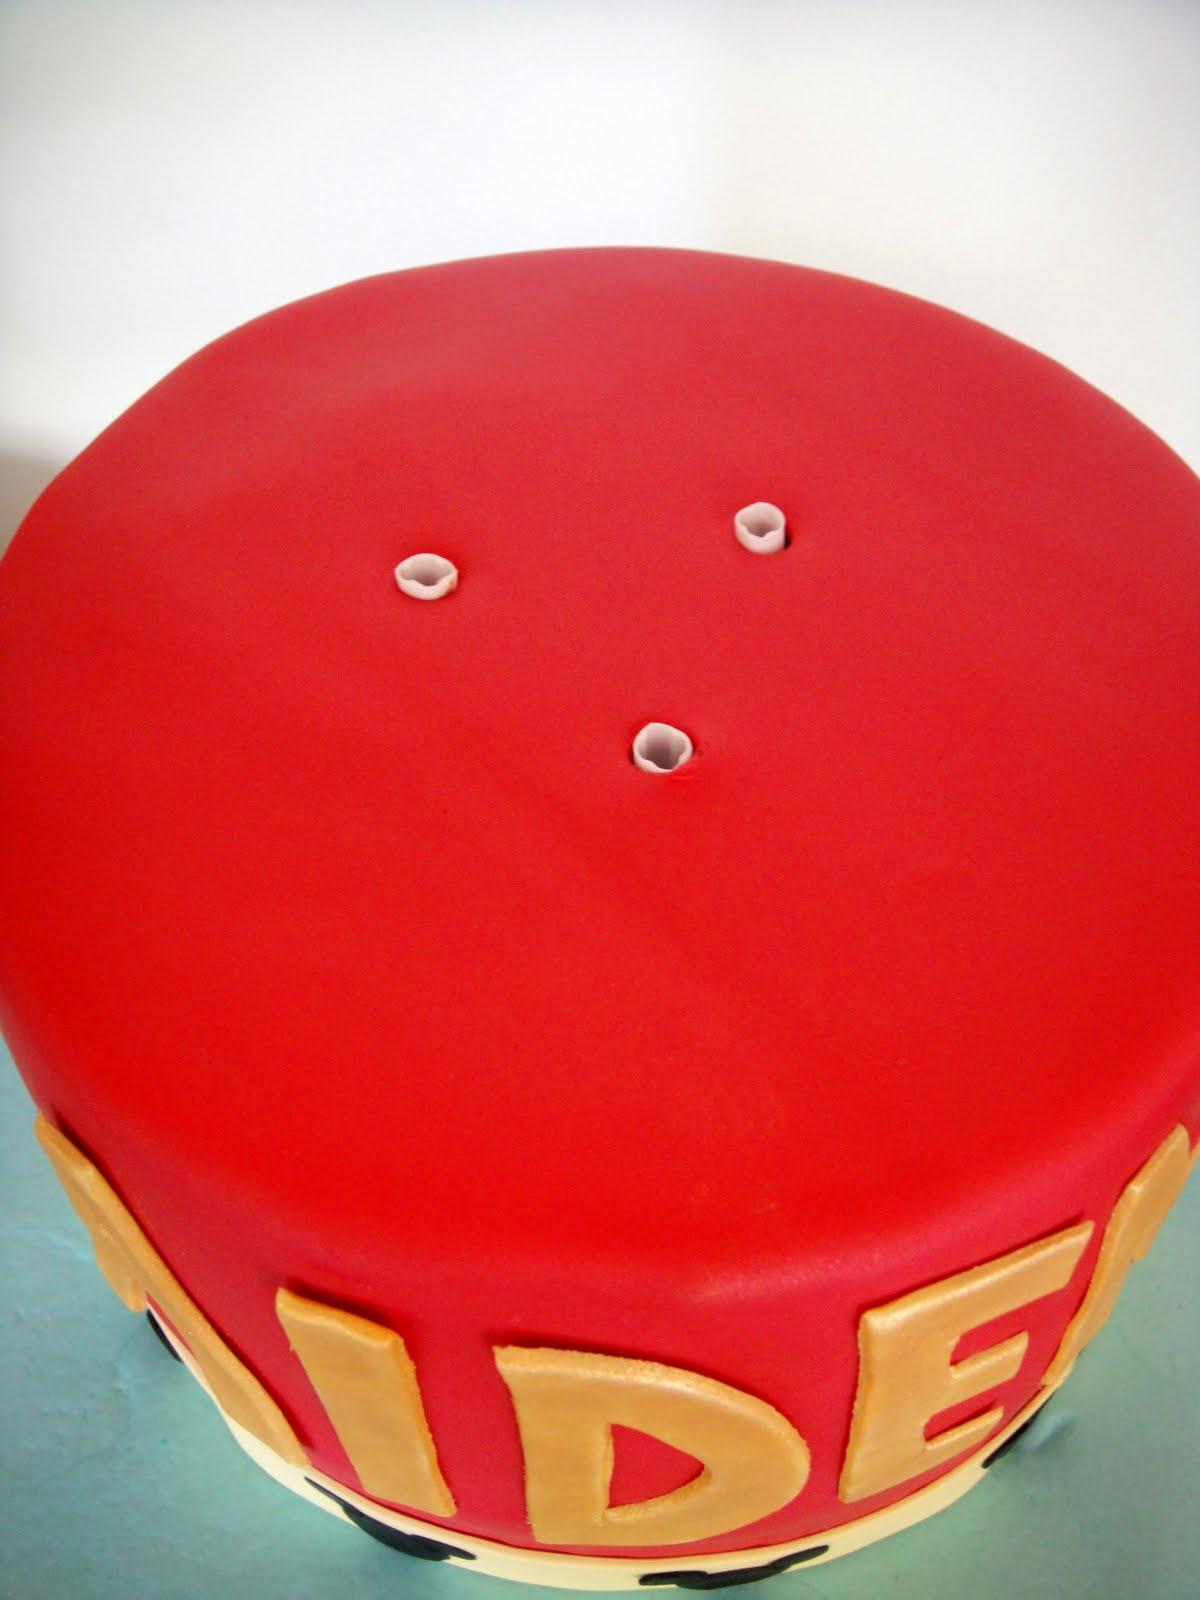 Doweling Cake